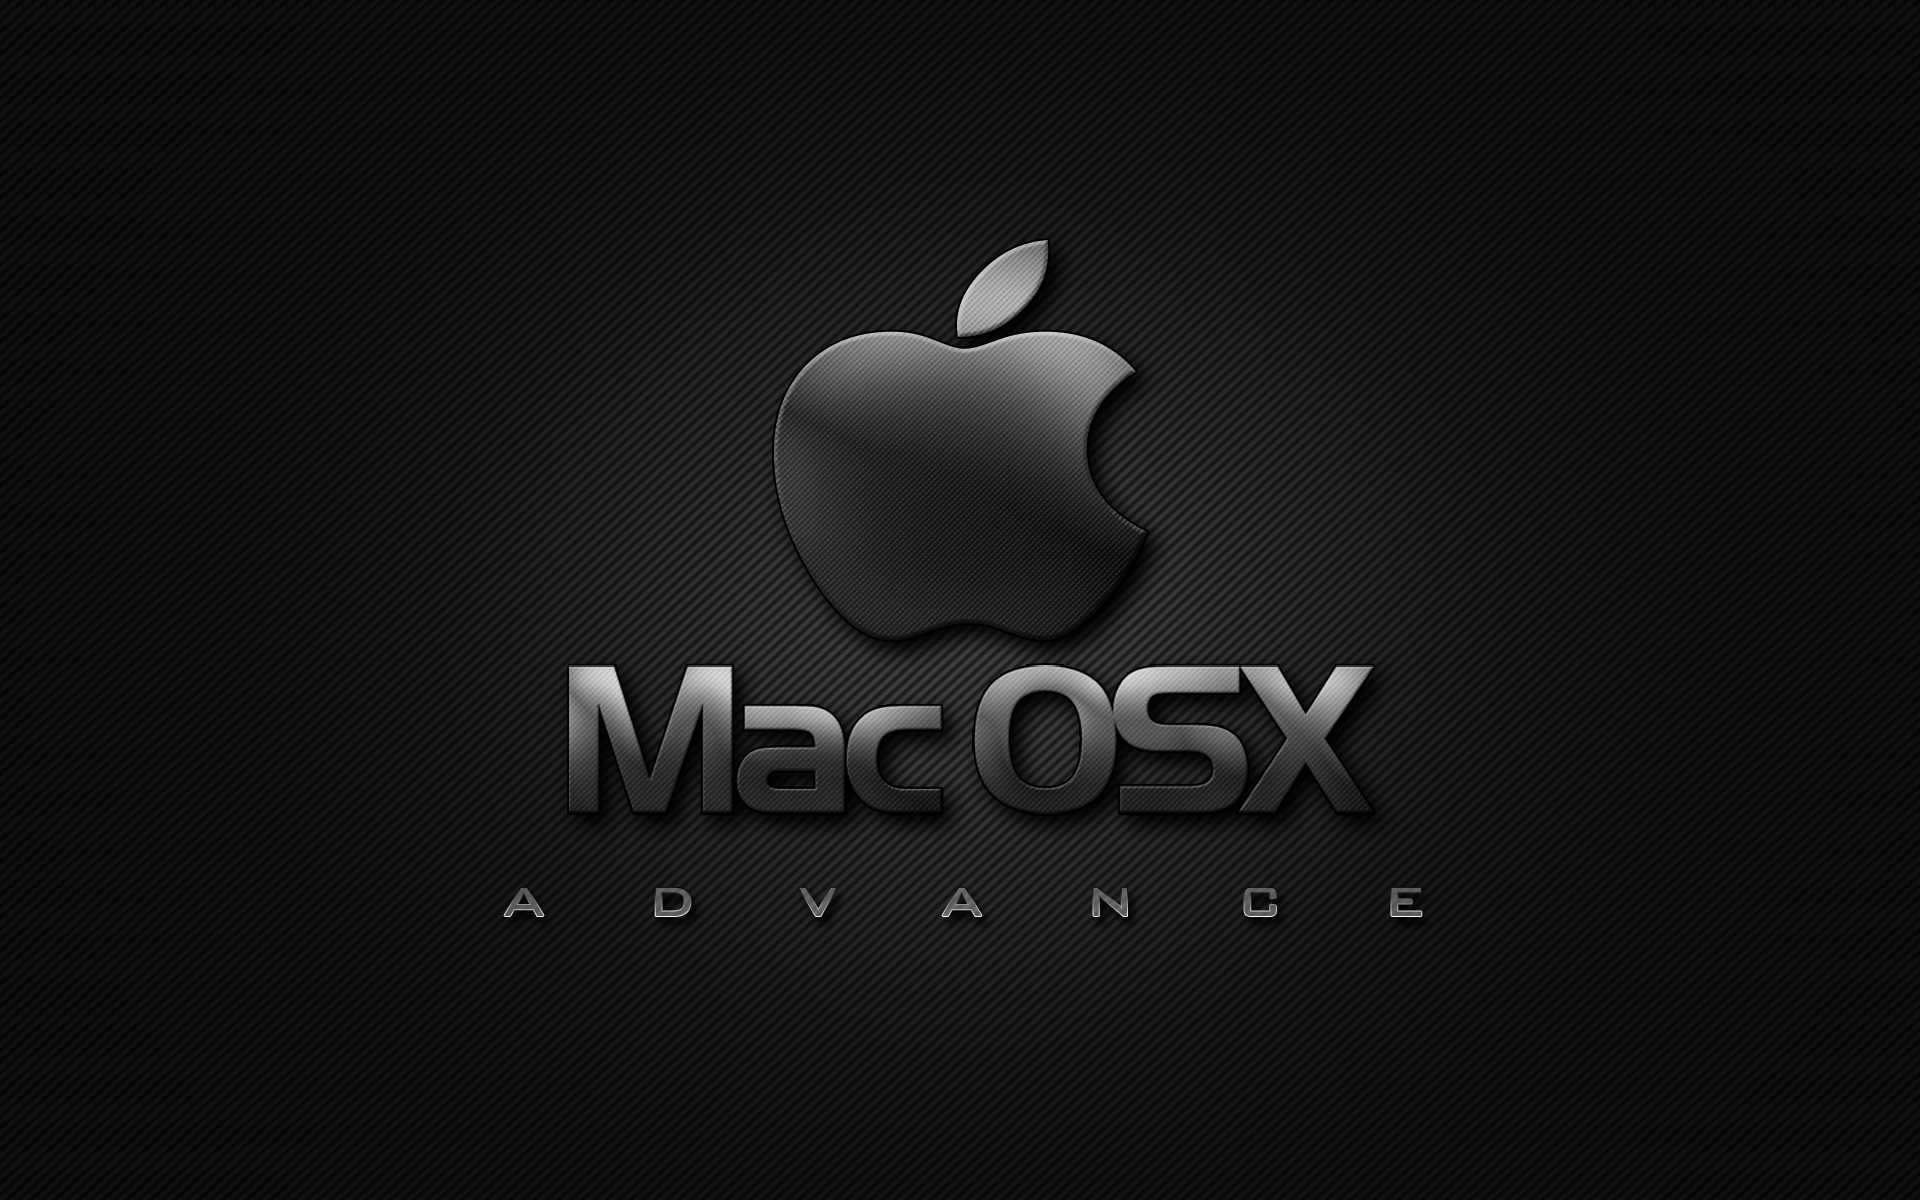 Macbook Air HD Wallpapers 28 Freetopwallpapercom 1920x1200